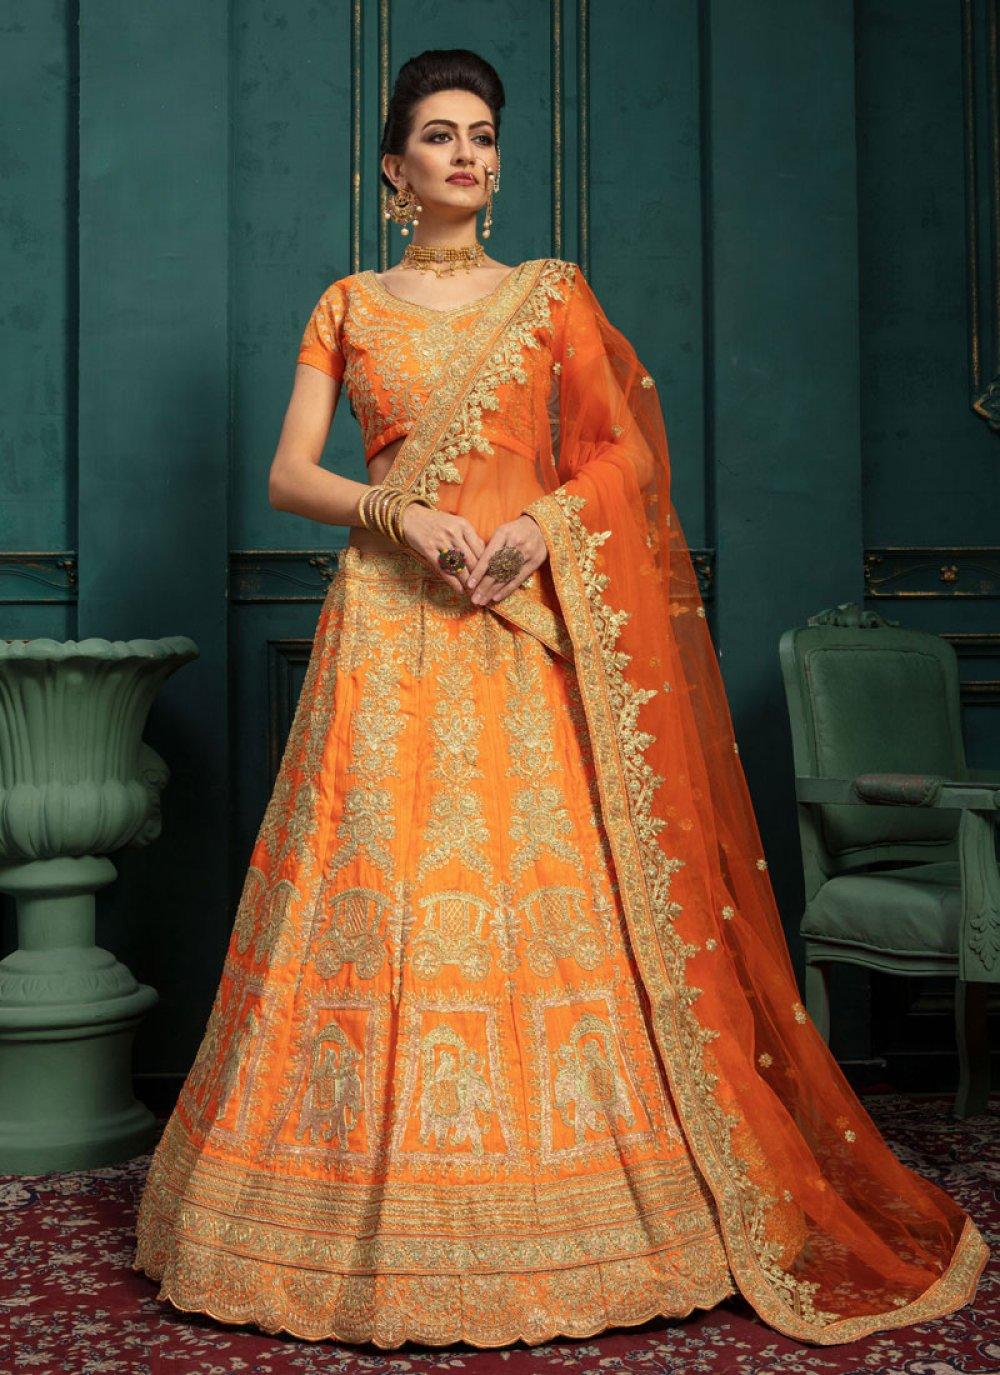 Malbari Silk  Embroidered Orange A Line Lehenga Choli